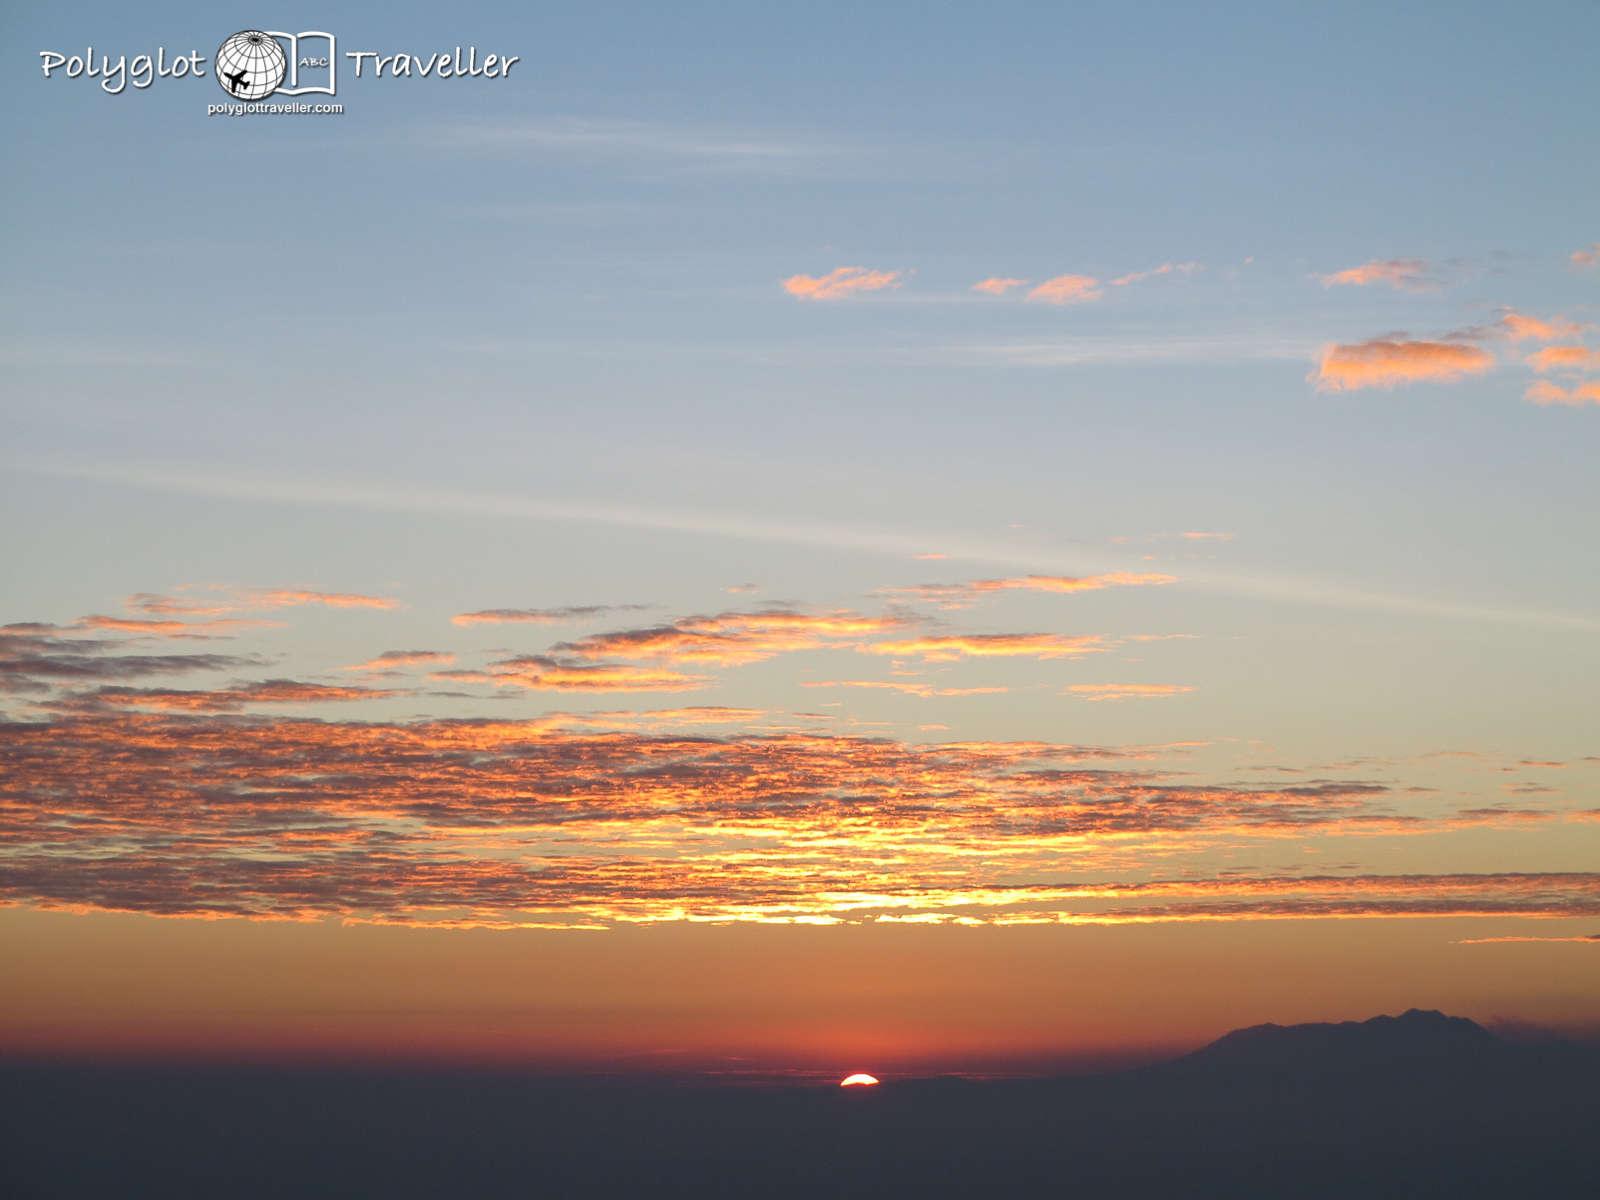 Sunrise says Hello world!